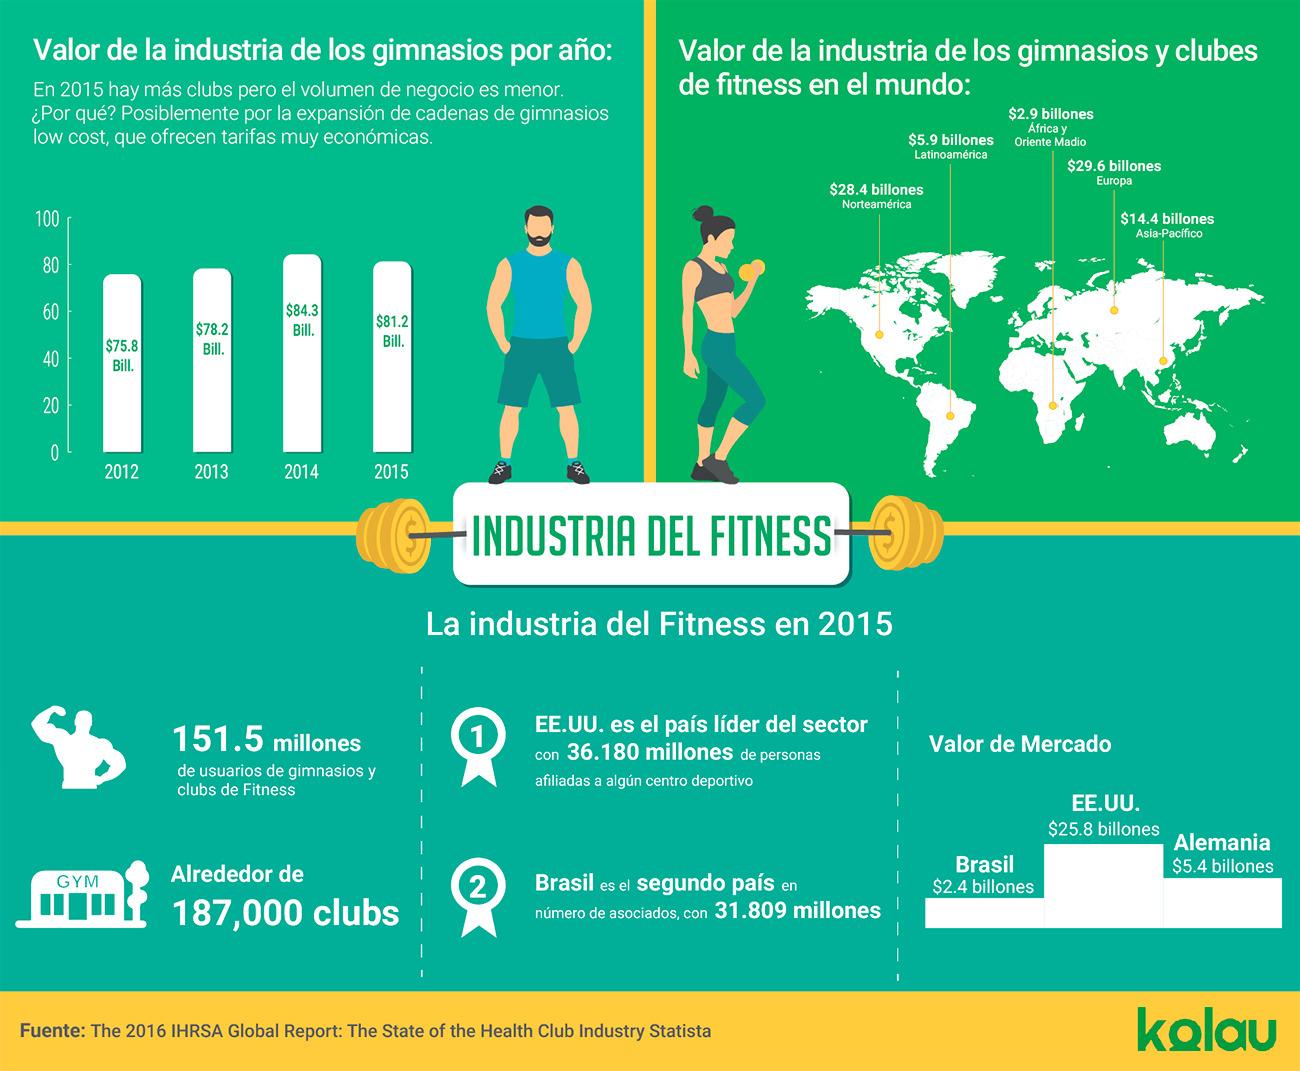 Infografía sobre la industria del Fitness